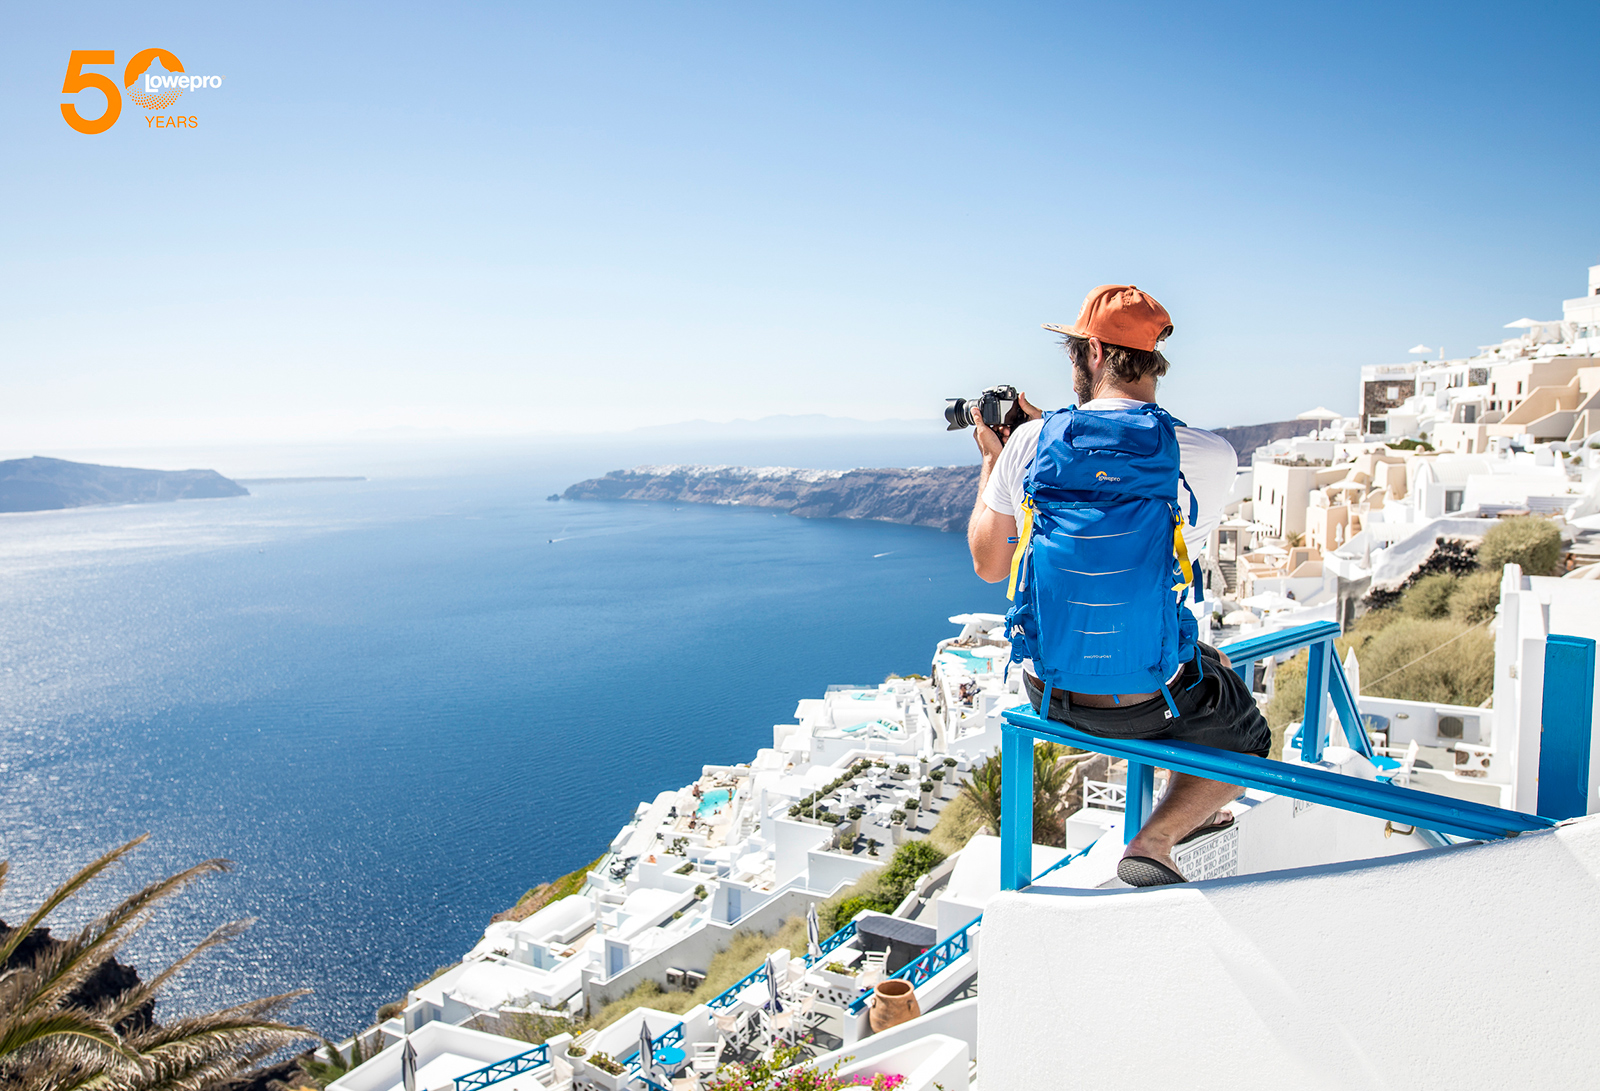 Lowepro Visits Santorini Greece